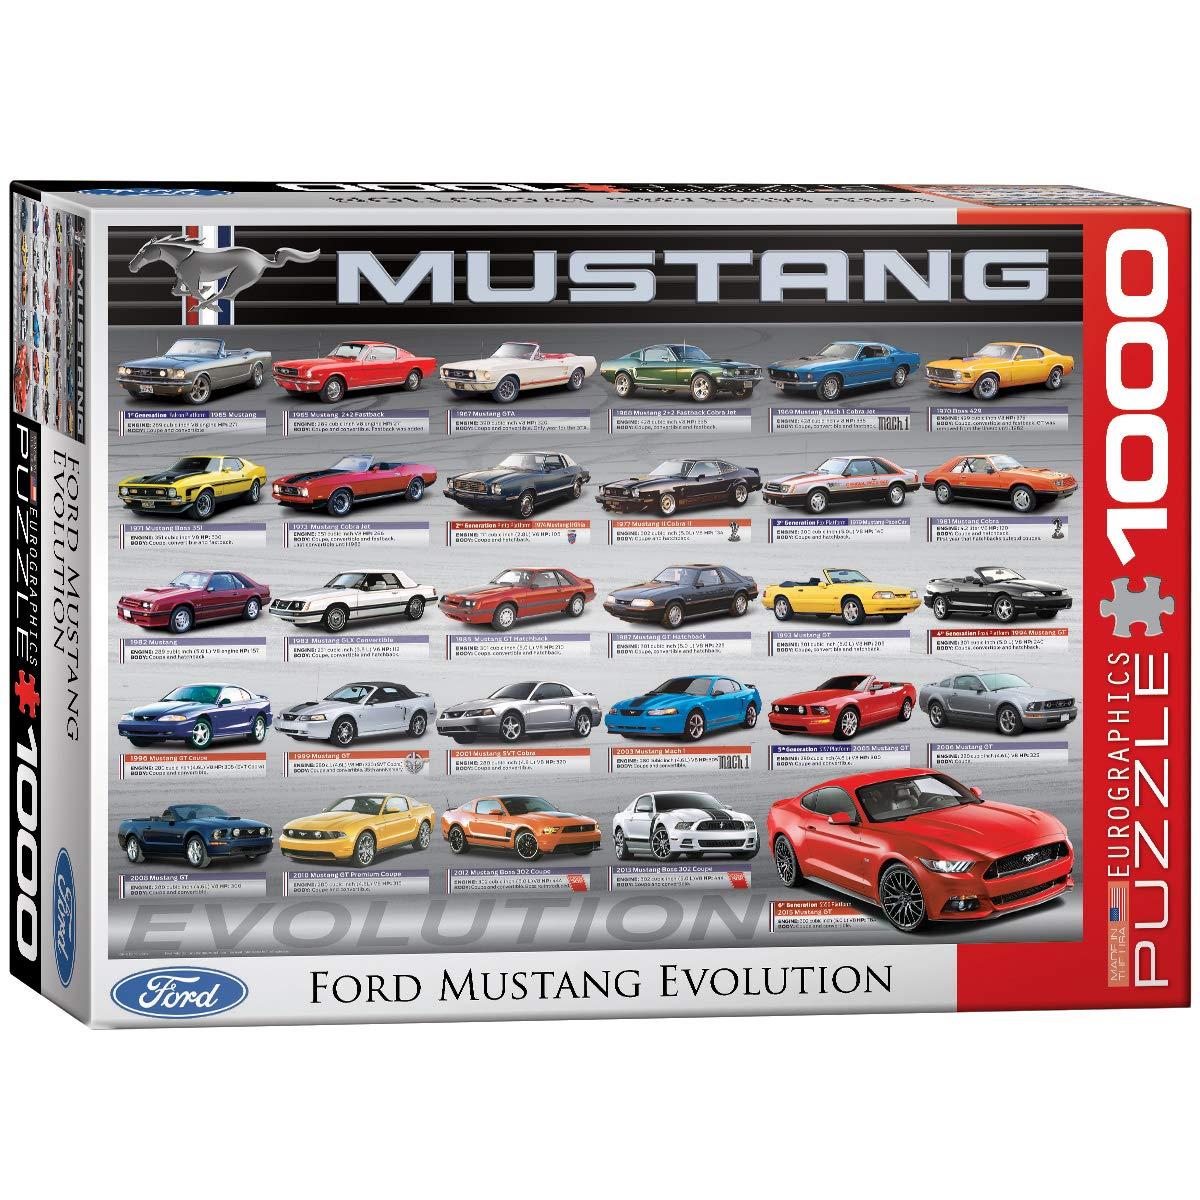 EuroGraphics Puzzle Ford Mustang Evolution (1000 Teile) für 10,49€ (Amazon Prime & Thalia Club)